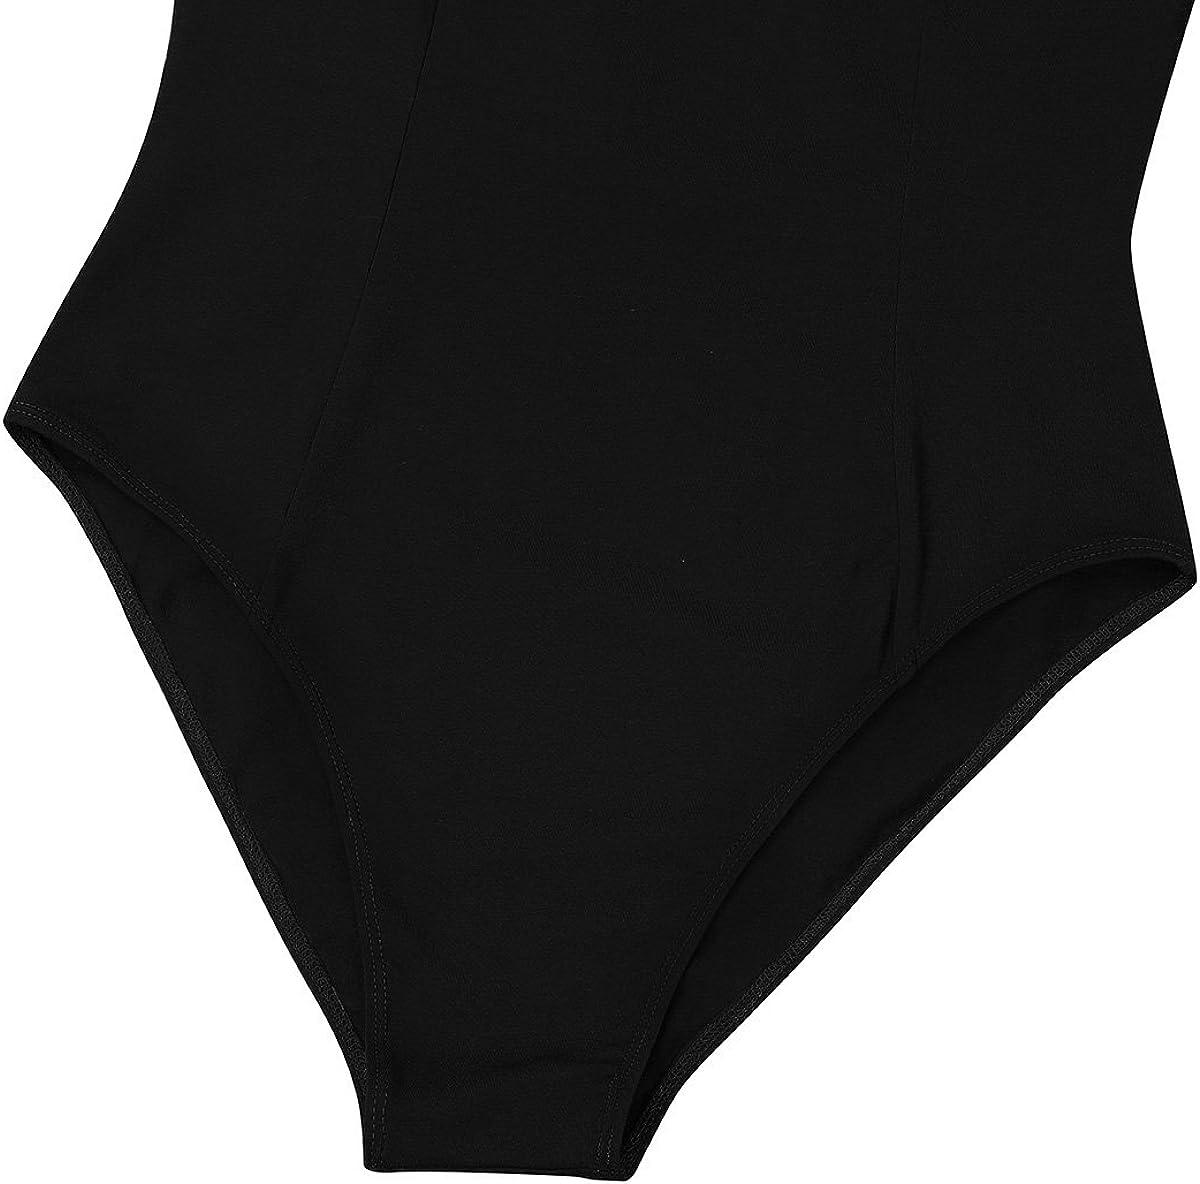 Aislor Womens Criss Cross Back Camisole Ballet Dance Leotard V-Neck Spaghetti Straps Bodysuit Dancewear